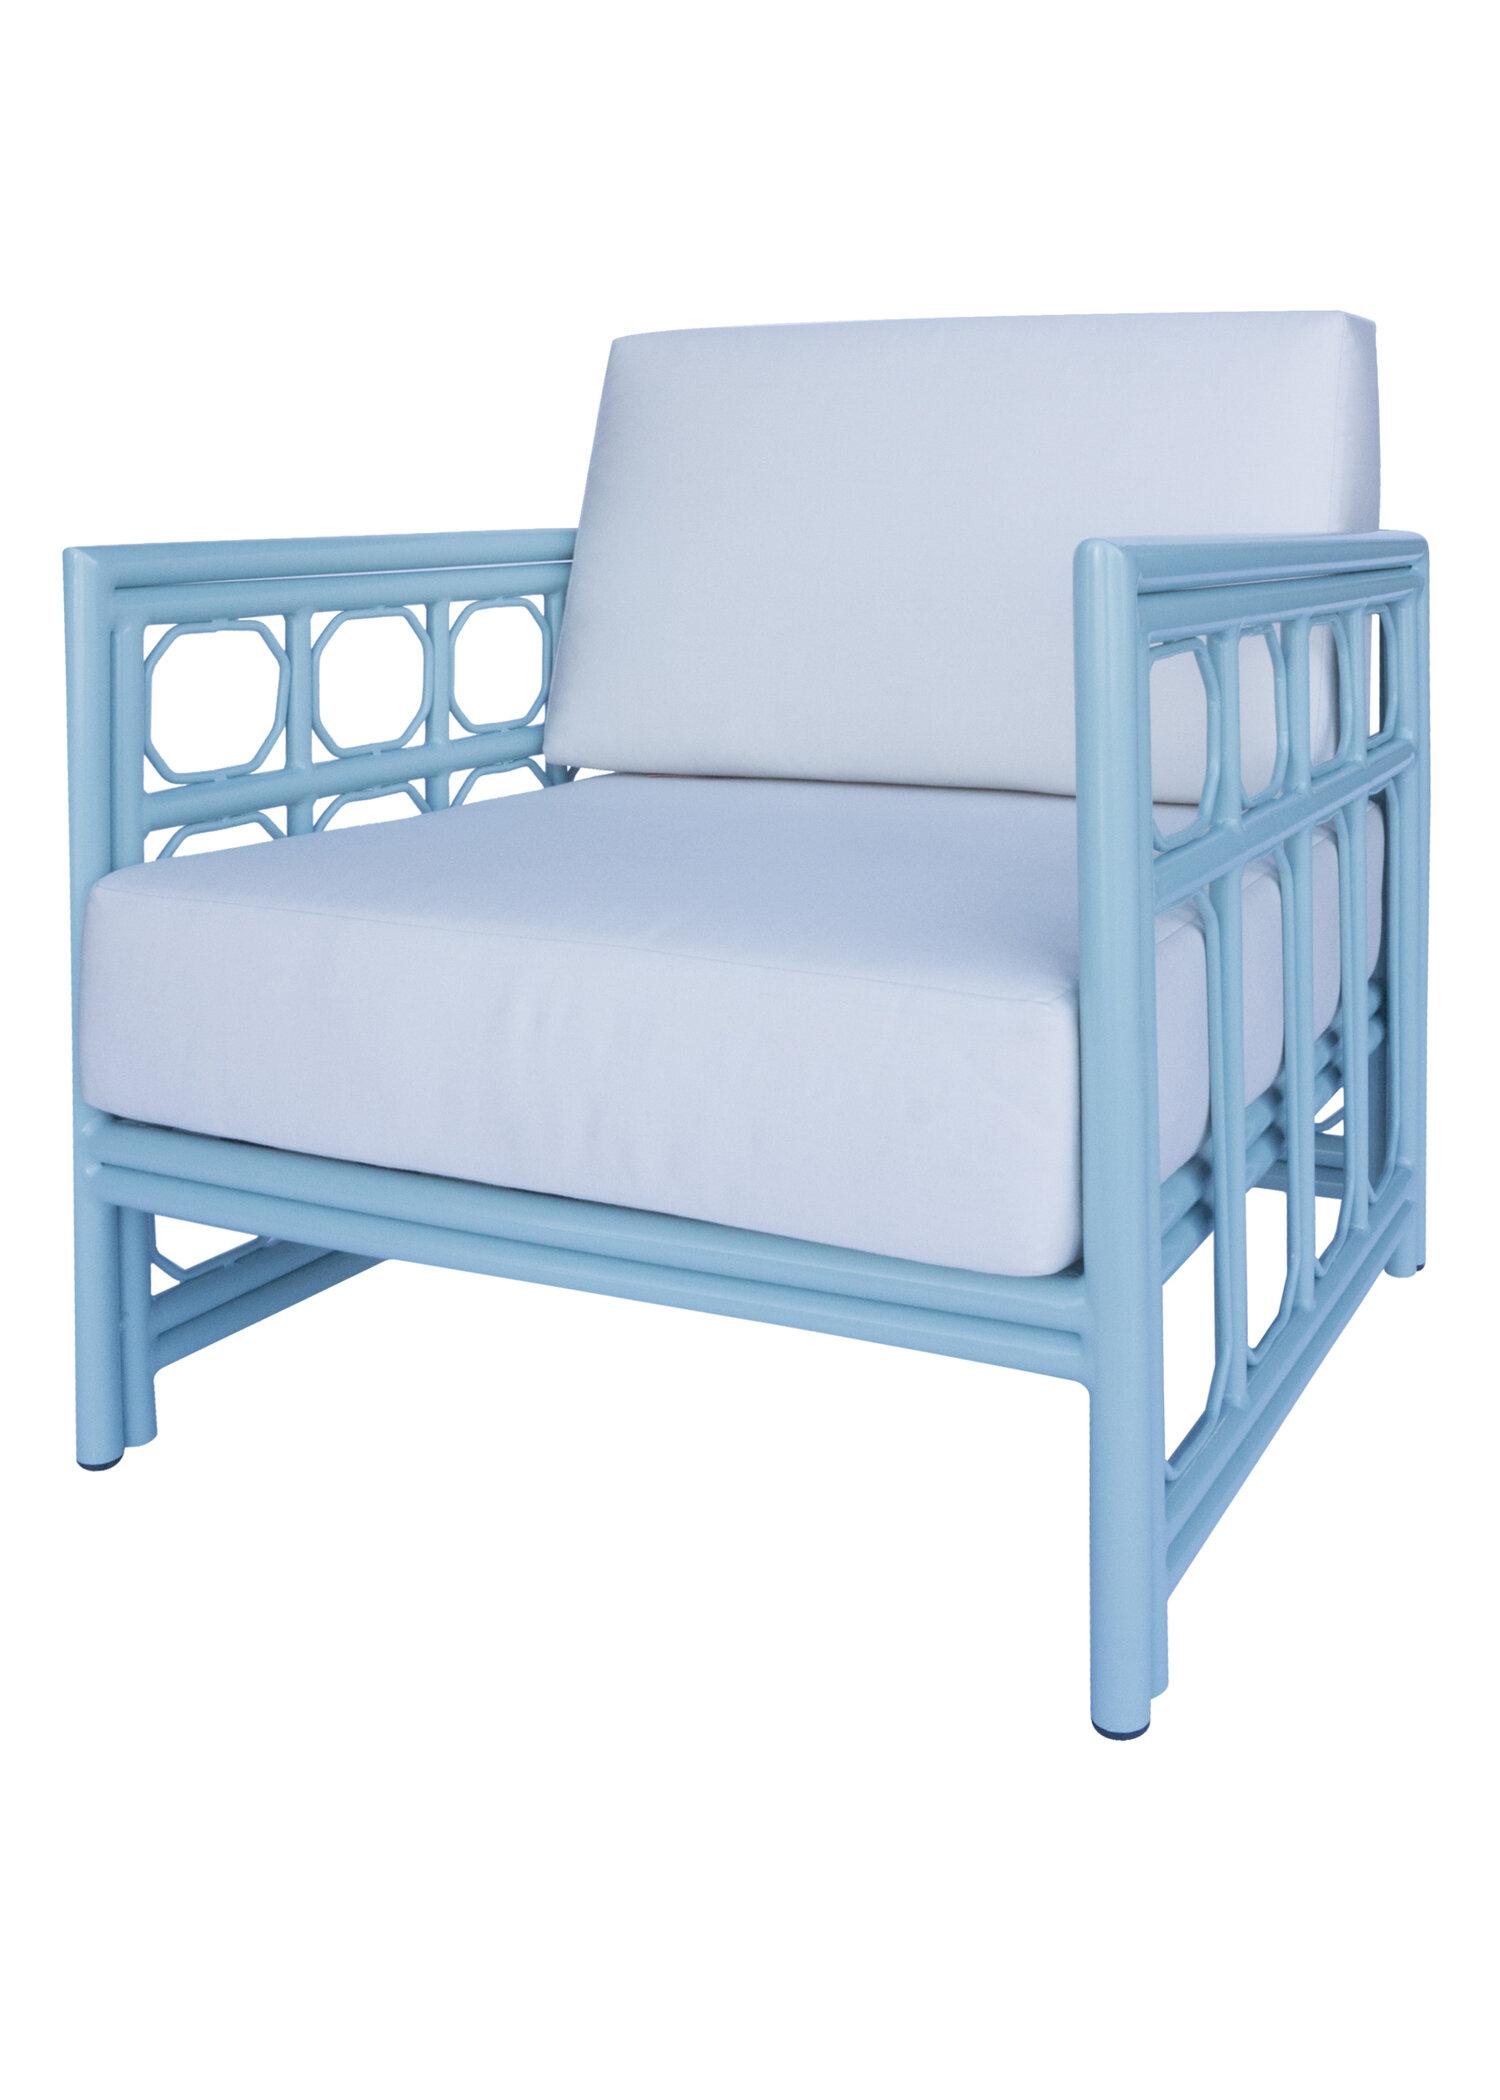 4 Chair Patio Set: Selamat Designs Regeant 4 Season Patio Chair With Cushion